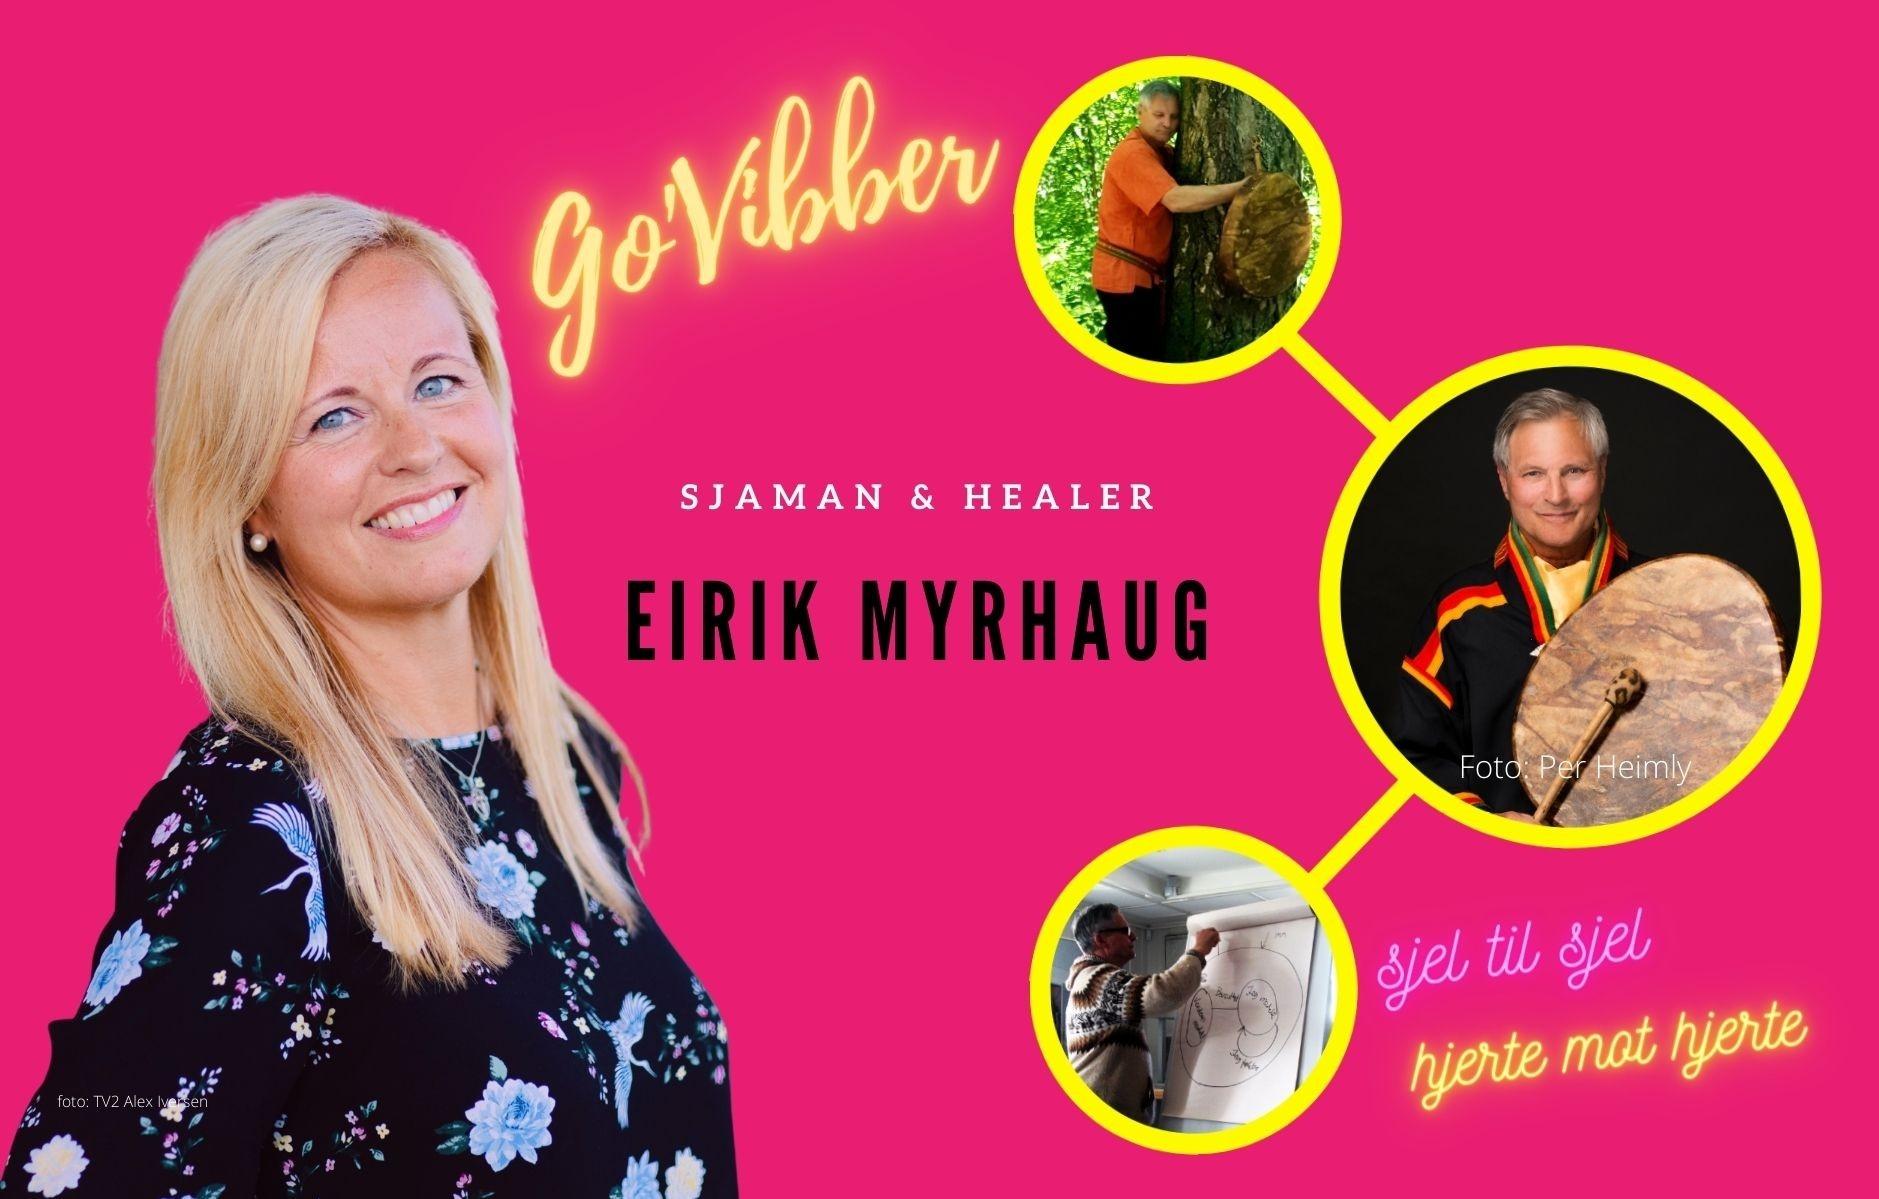 Hva tenner gnisten i Sjaman Eirik Myrhaug?